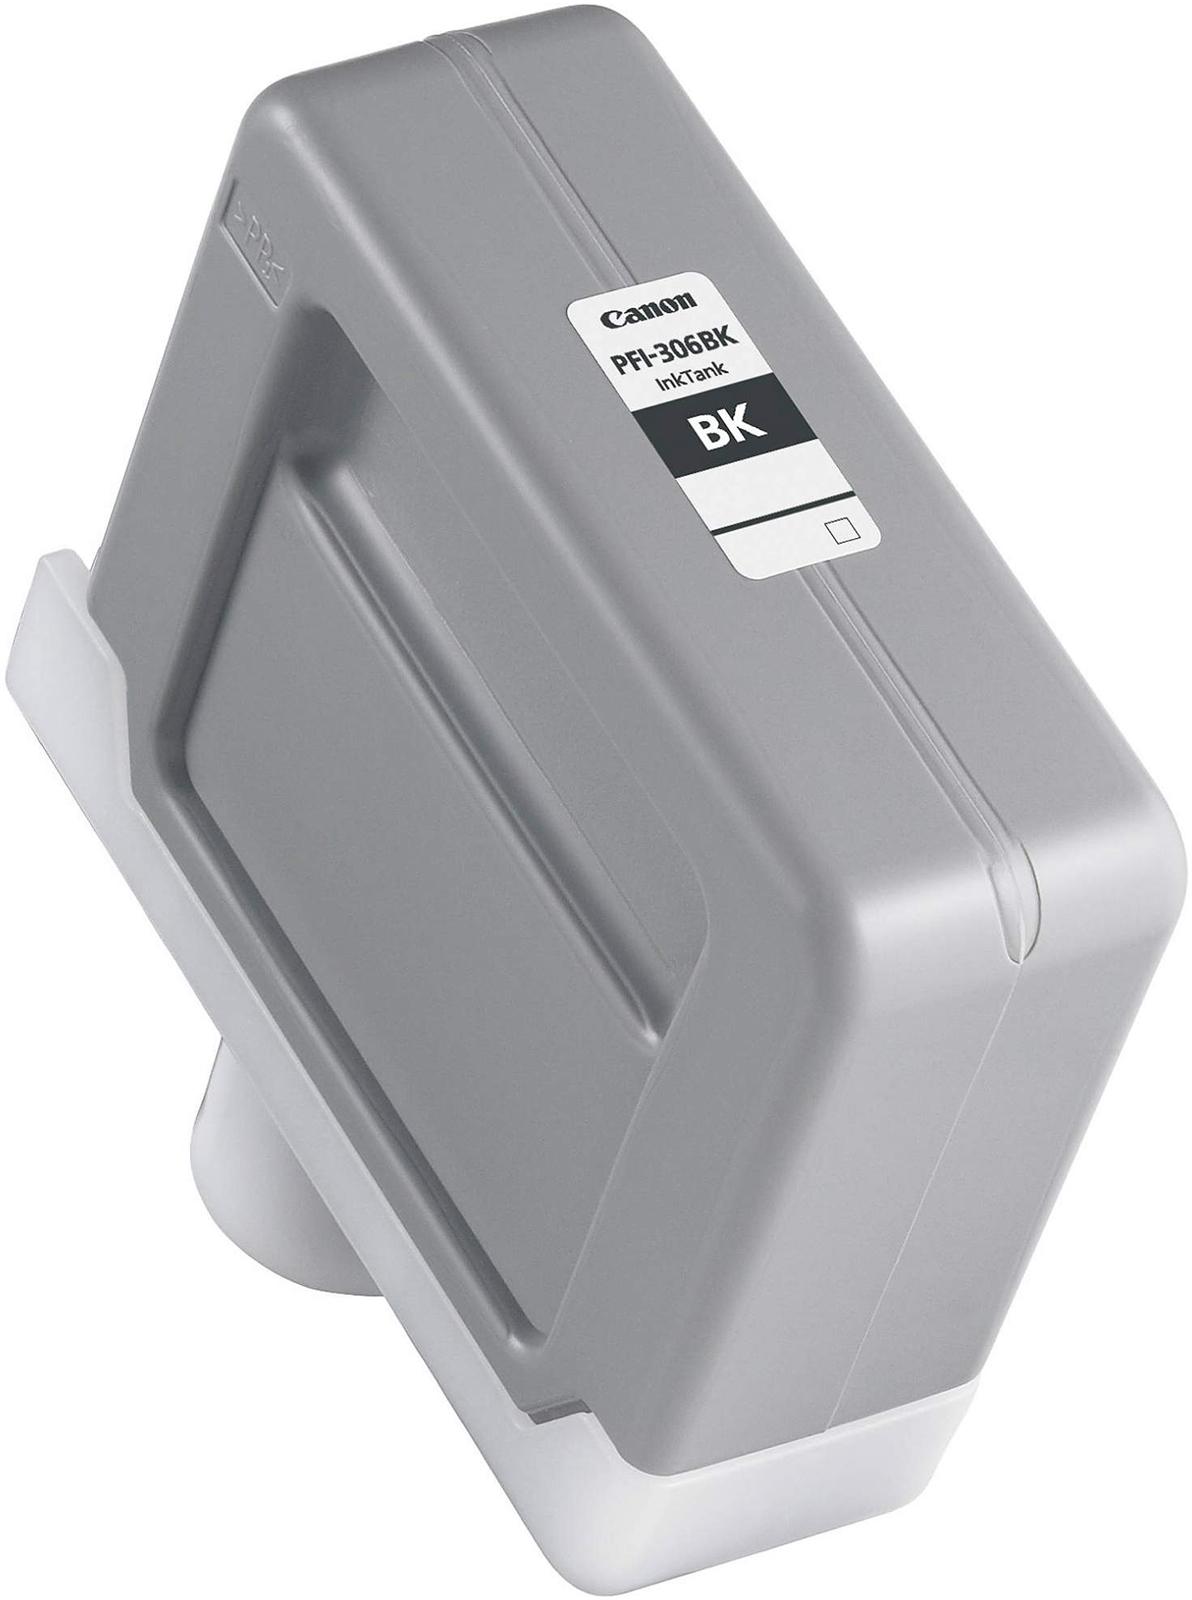 Картридж Canon PFI-307 BK для плоттера iPF830/840/850. Черный. 330 мл. цена